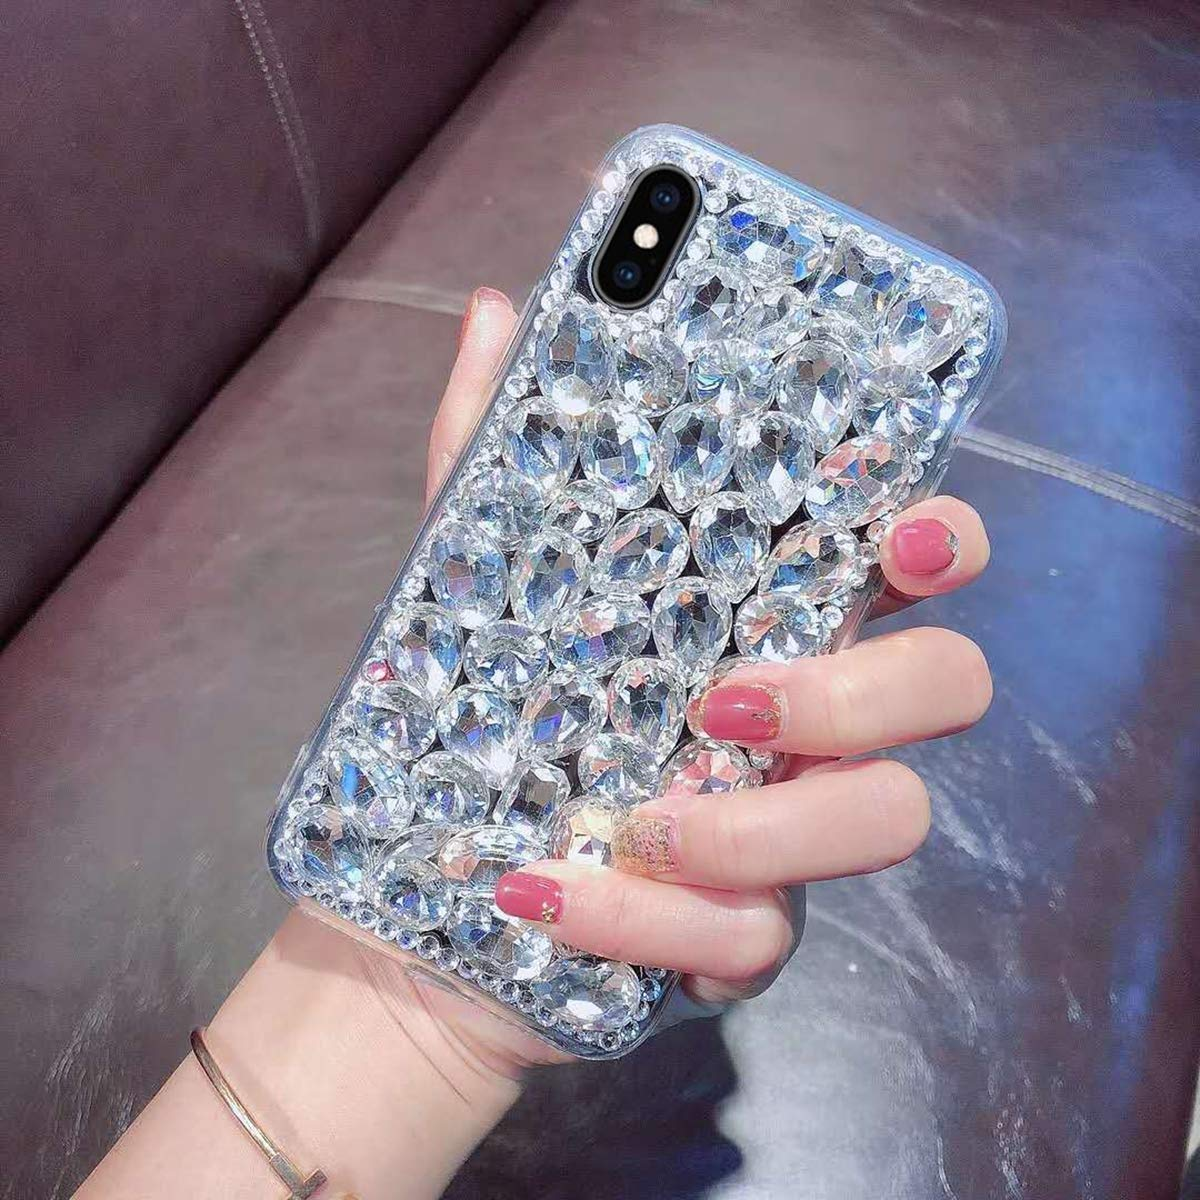 Luxus Glitzer H/ülle f/ür Galaxy Note 8 Misstars 3D Bling Diamant Handyh/ülle Transparent Hart PC R/ückschale mit Silikon TPU Rahmen Schutzh/ülle f/ür Samsung Galaxy Note 8 Silber